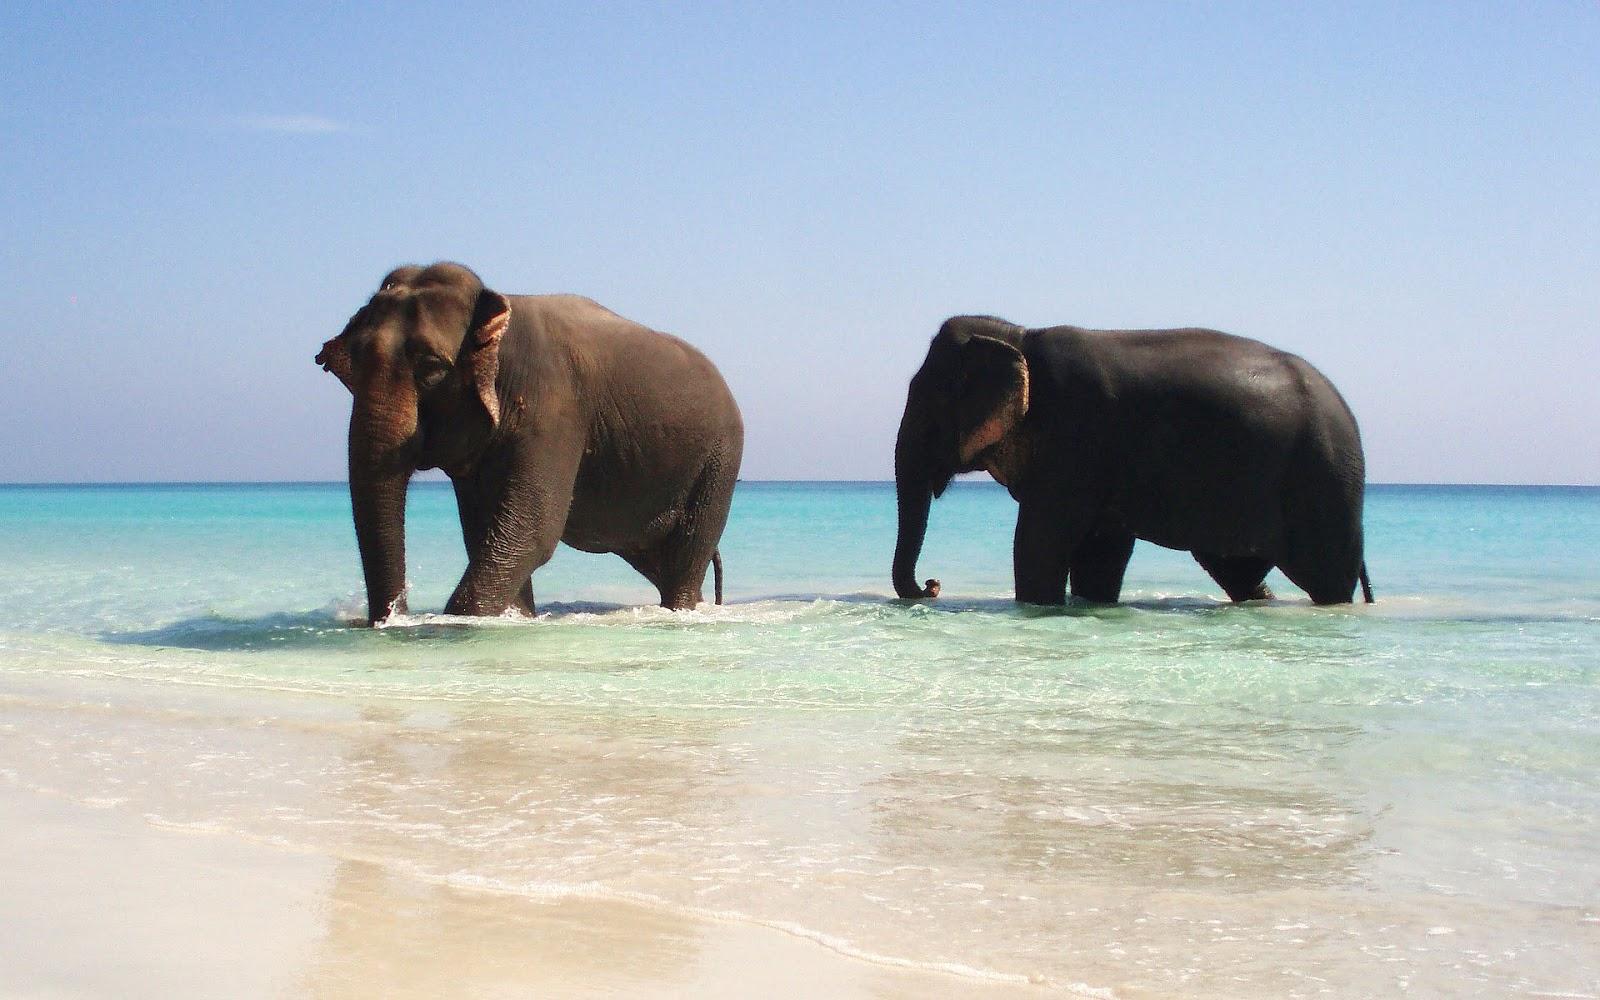 hd elephant images